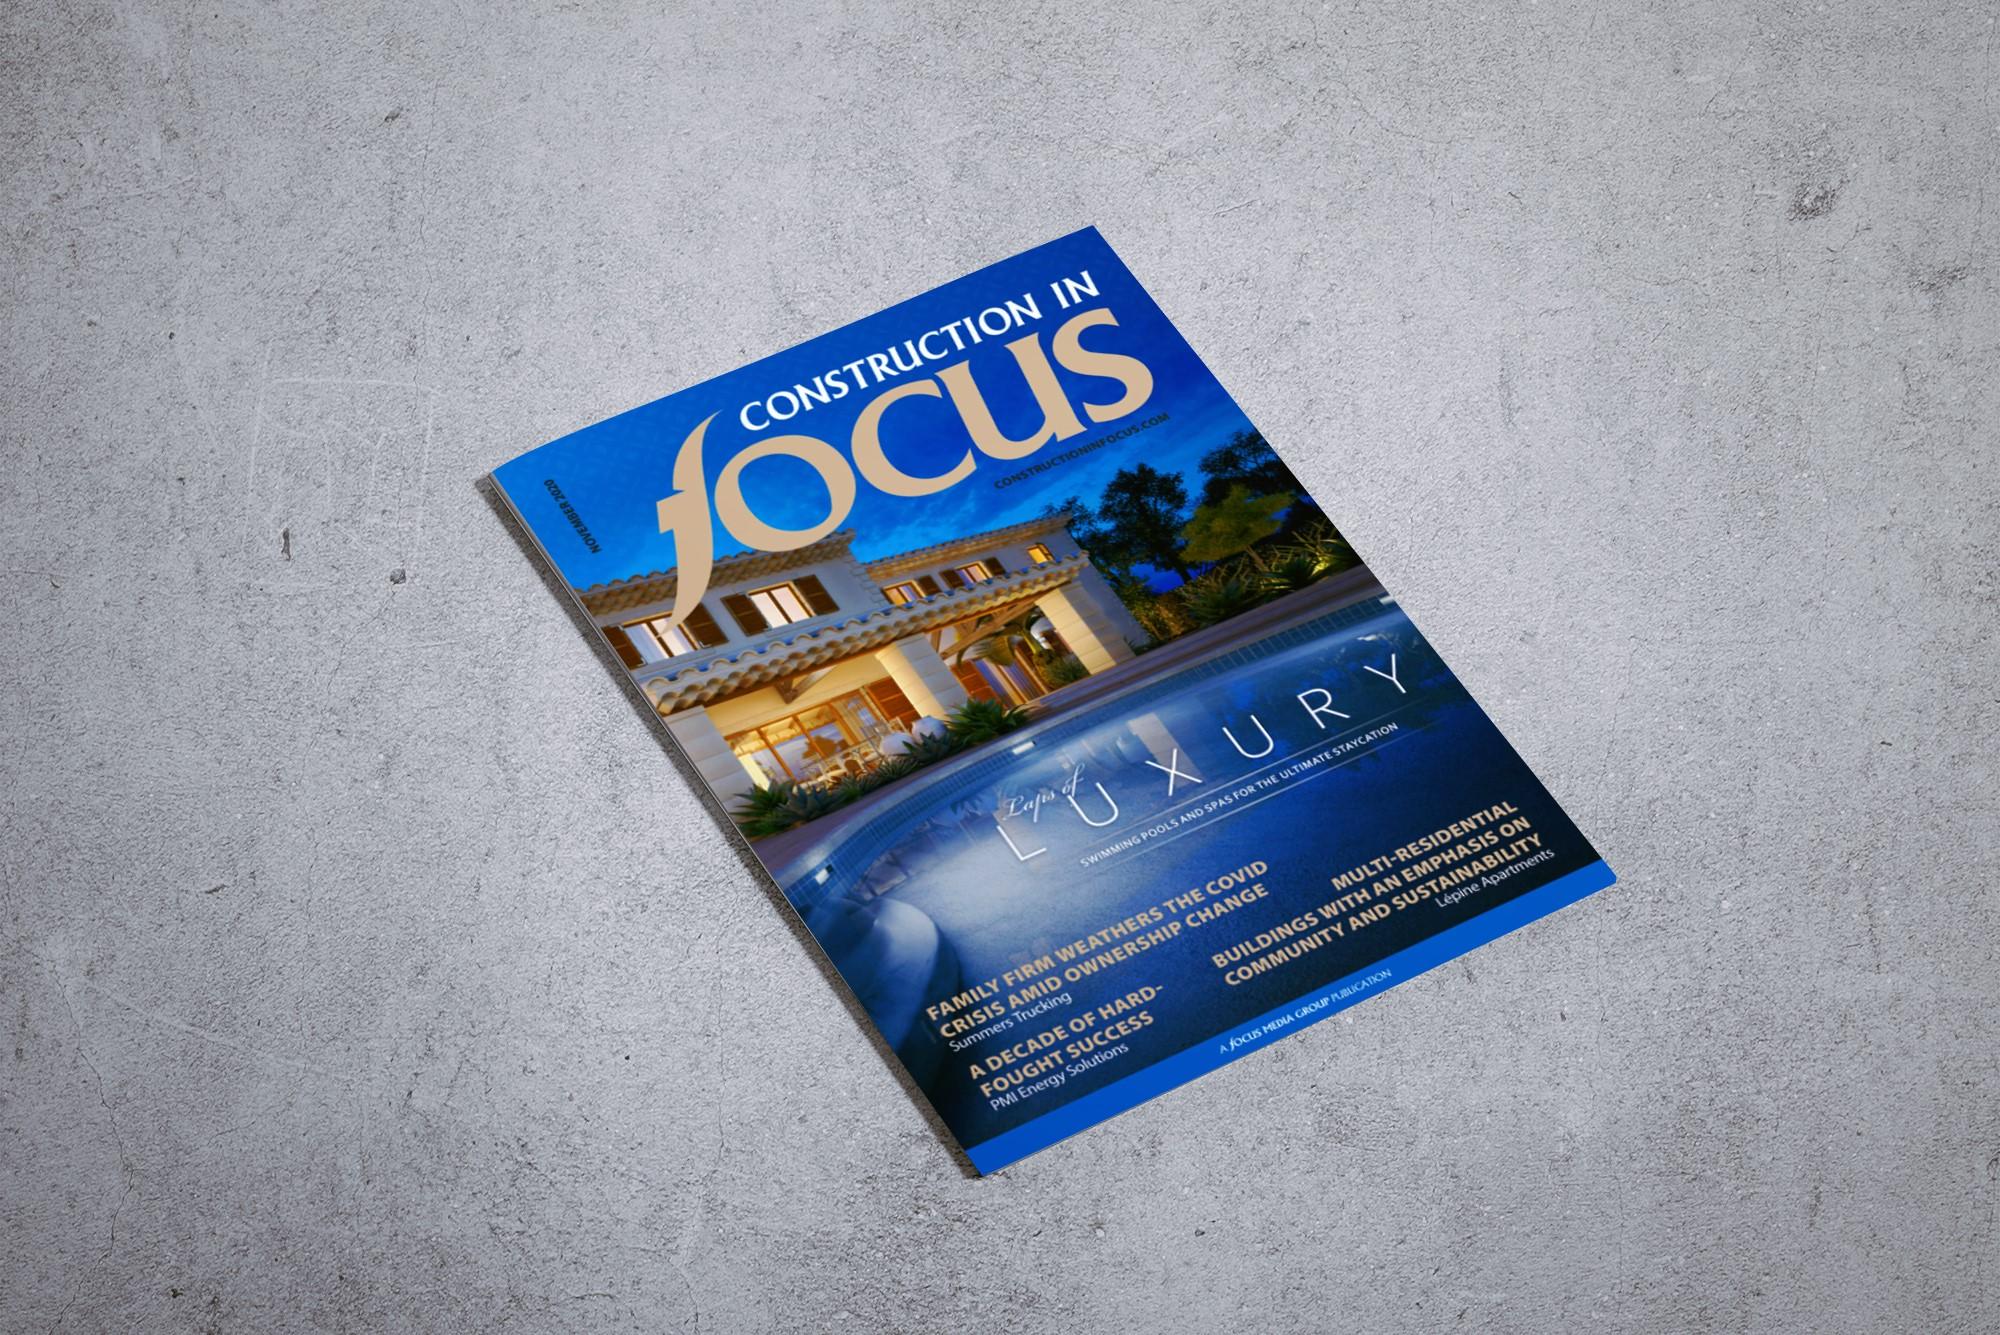 Standard Metal Hardware featured in Construction in Focus